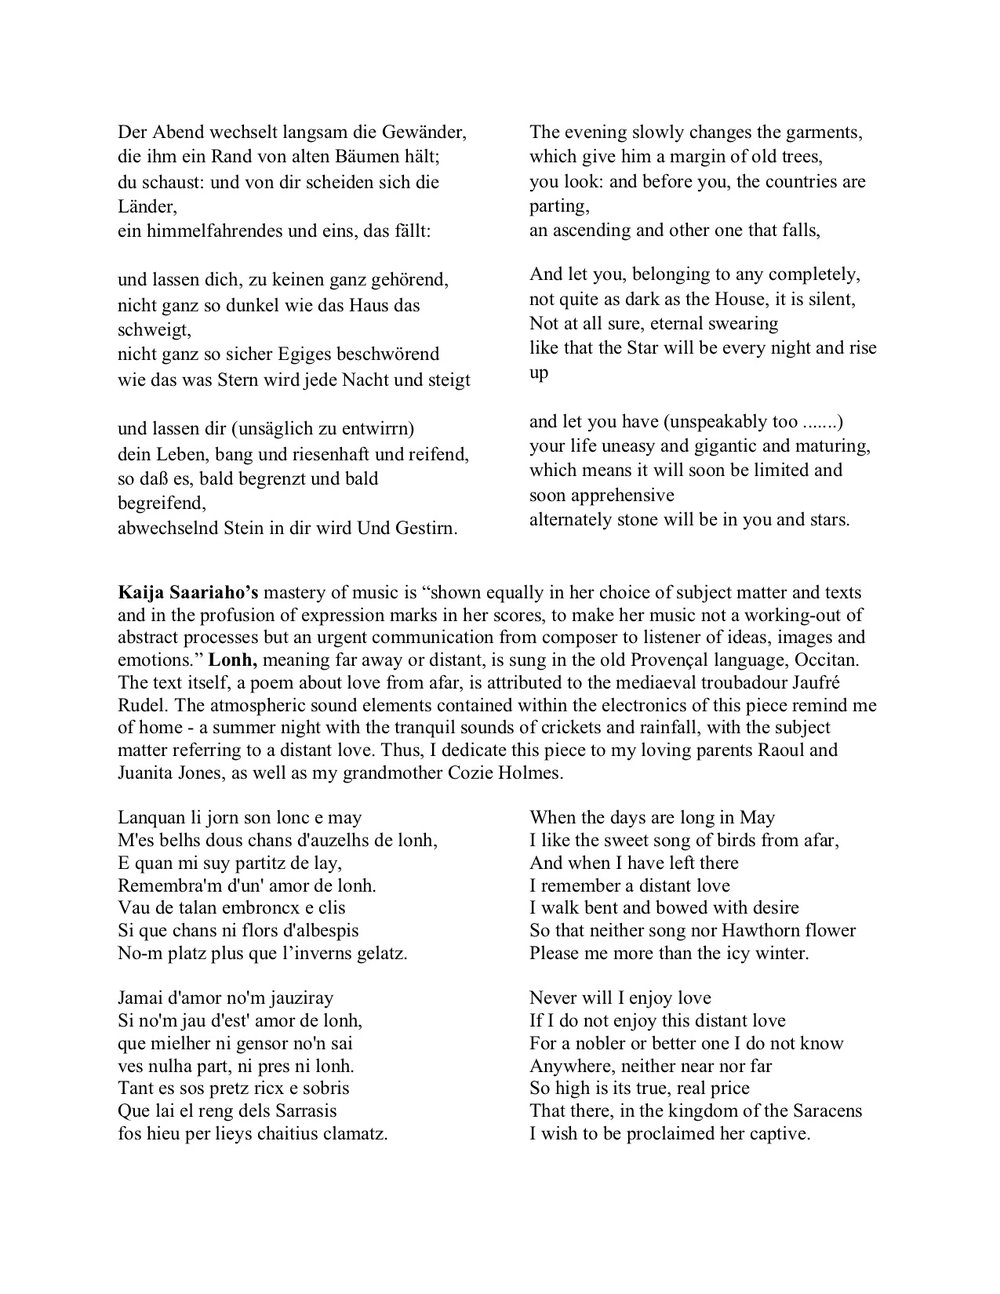 Graduate Recital Program Notes pg.3.jpg